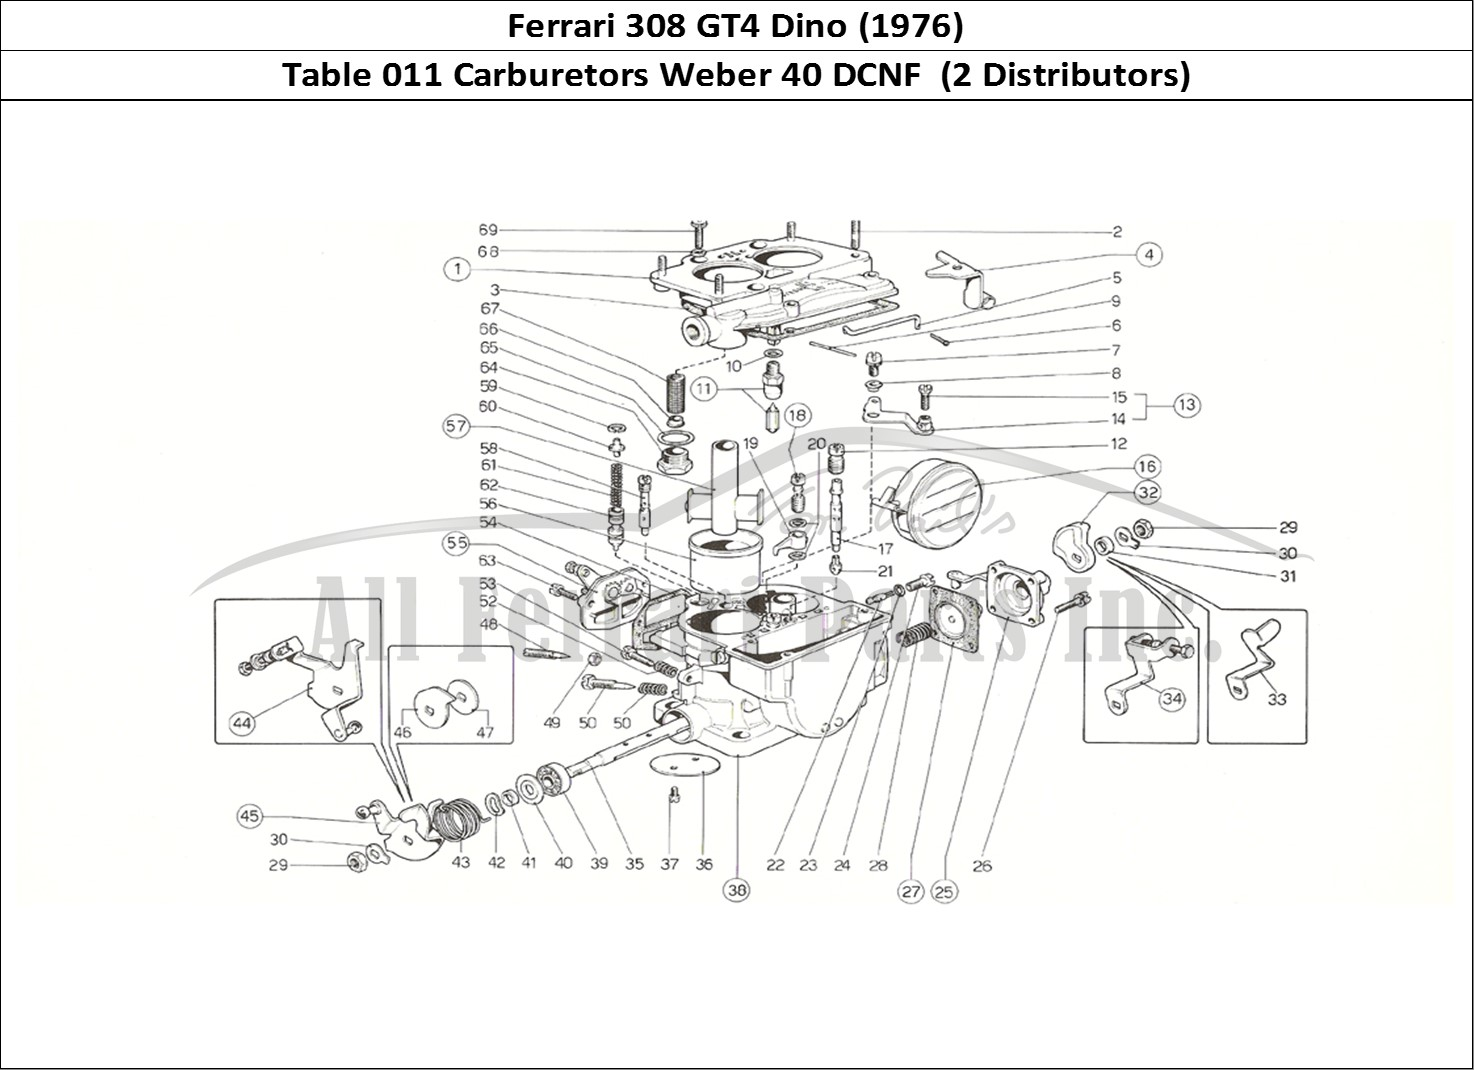 Buy original Ferrari 308 GT4 Dino (1976) 011 Carburetors